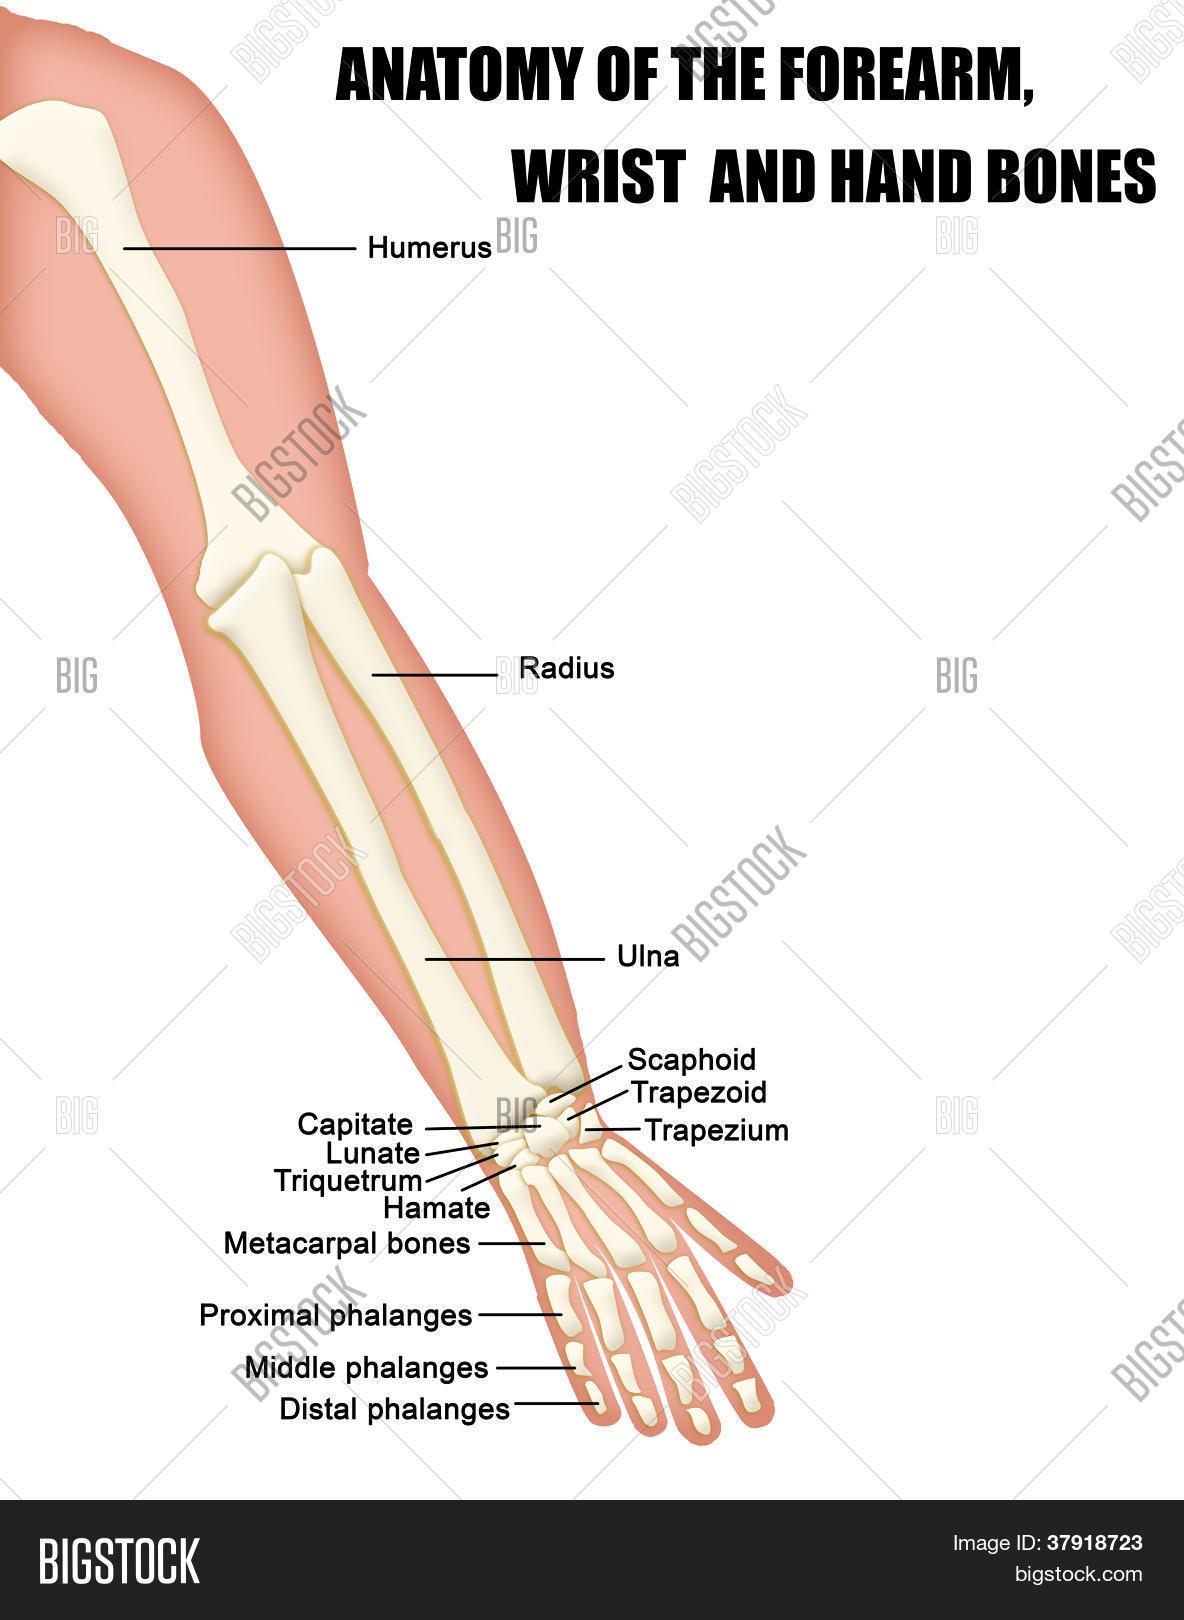 Anatomy Forearm, Wrist Hand Bones Vector & Photo | Bigstock